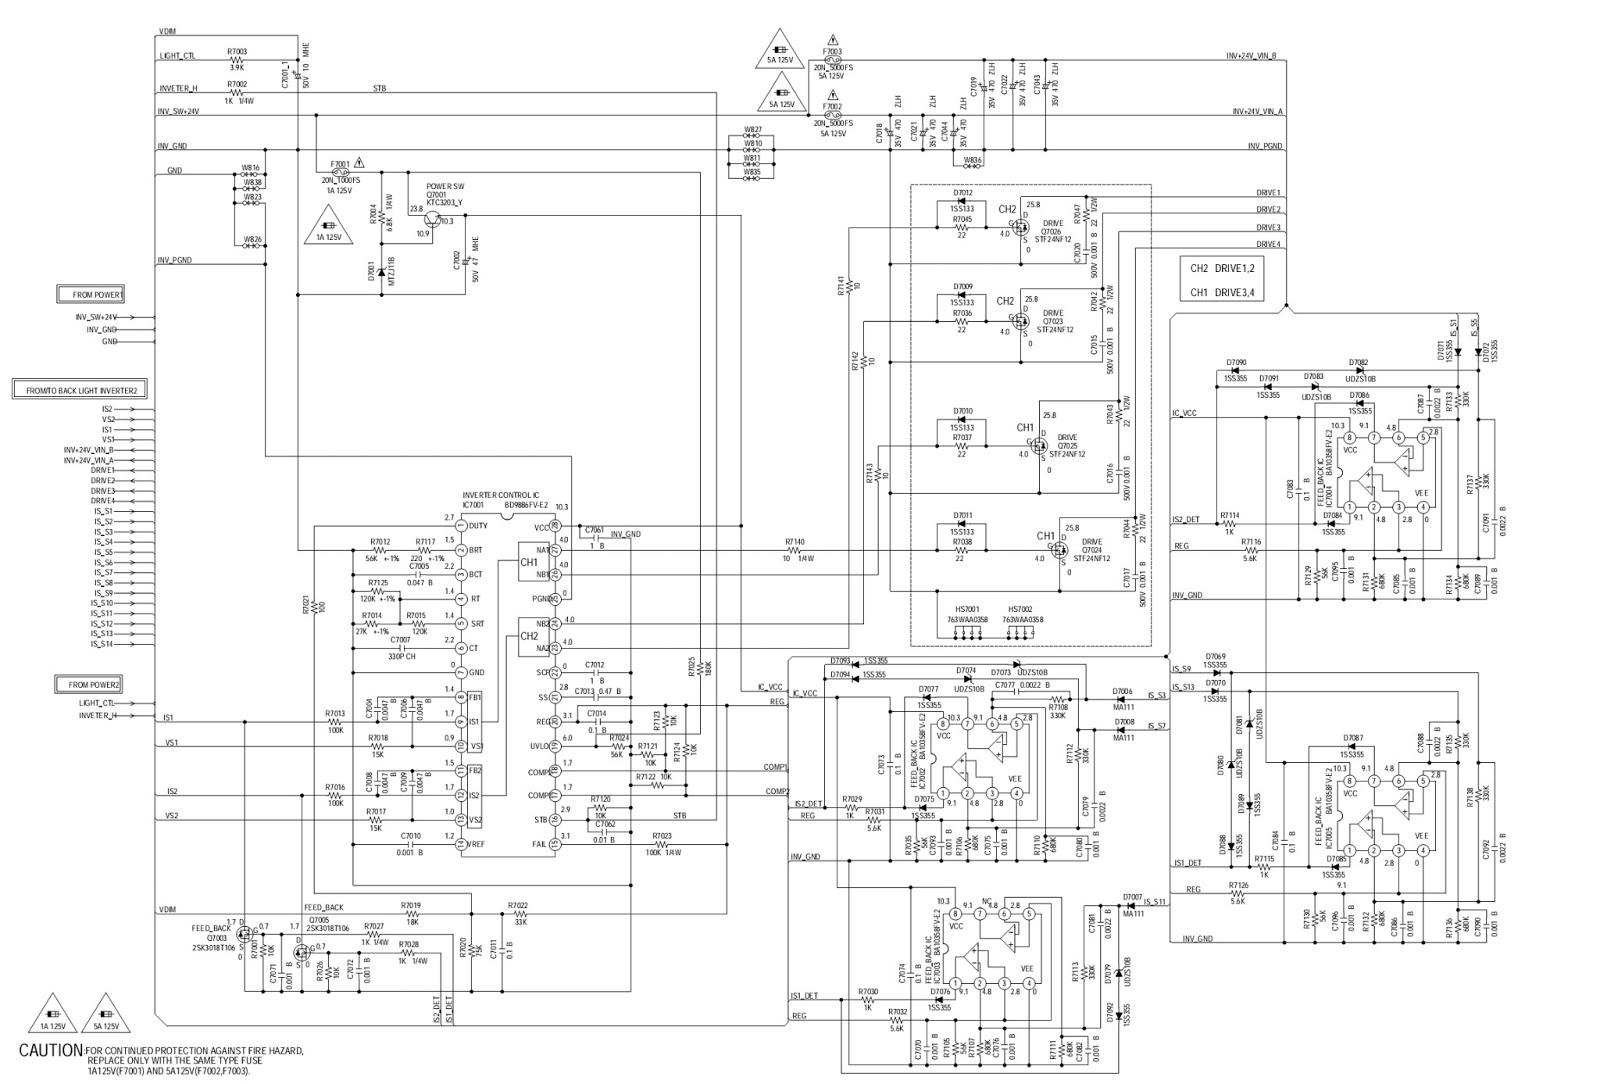 RCA L32WD26D LCD TV MAIN POWER SUB POWER BACKLIGHT INVERTER